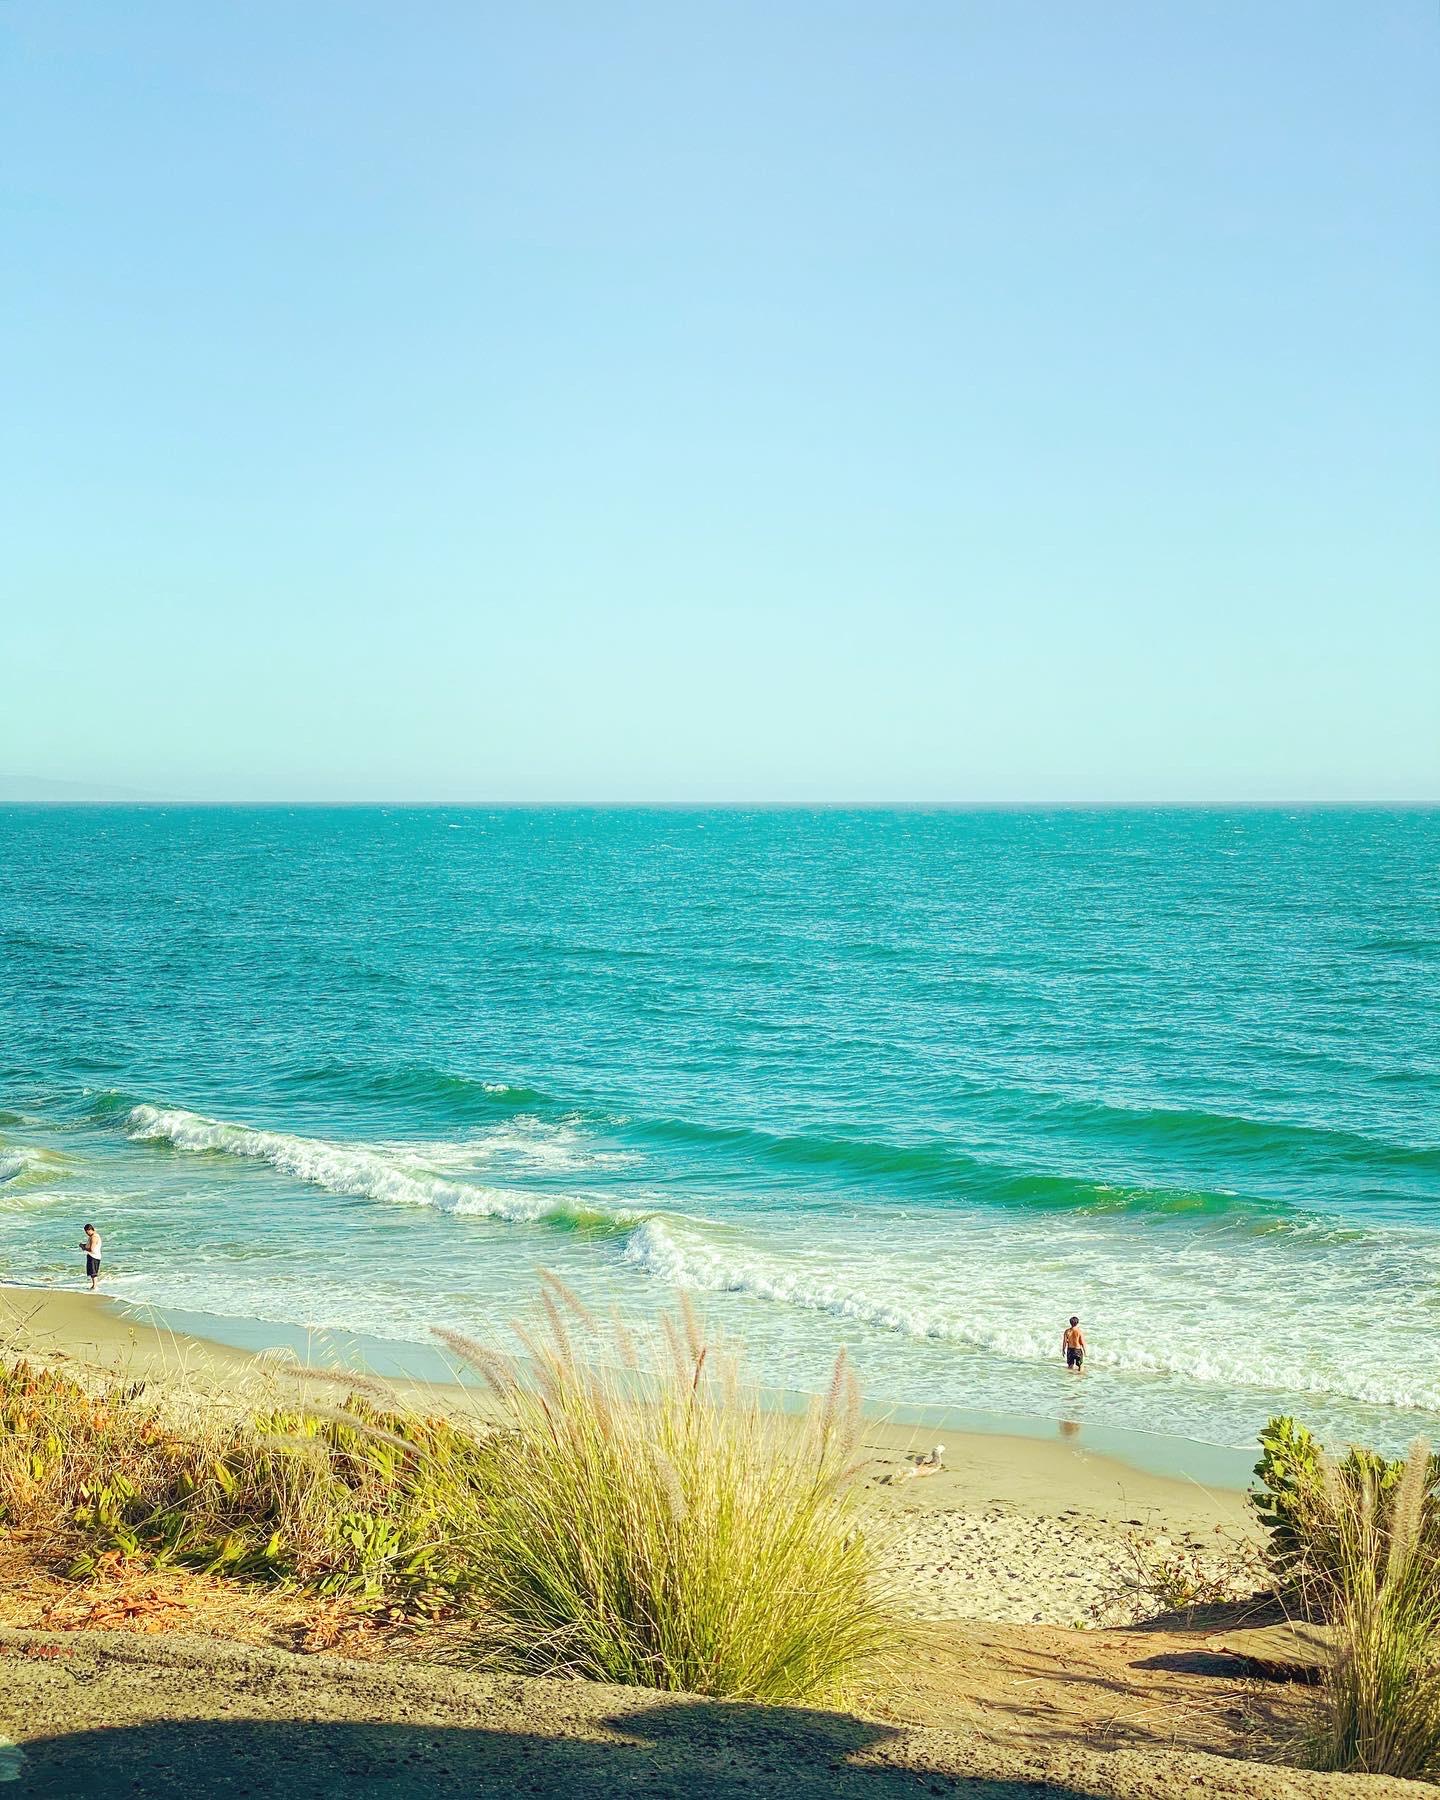 malibu ocean side of road